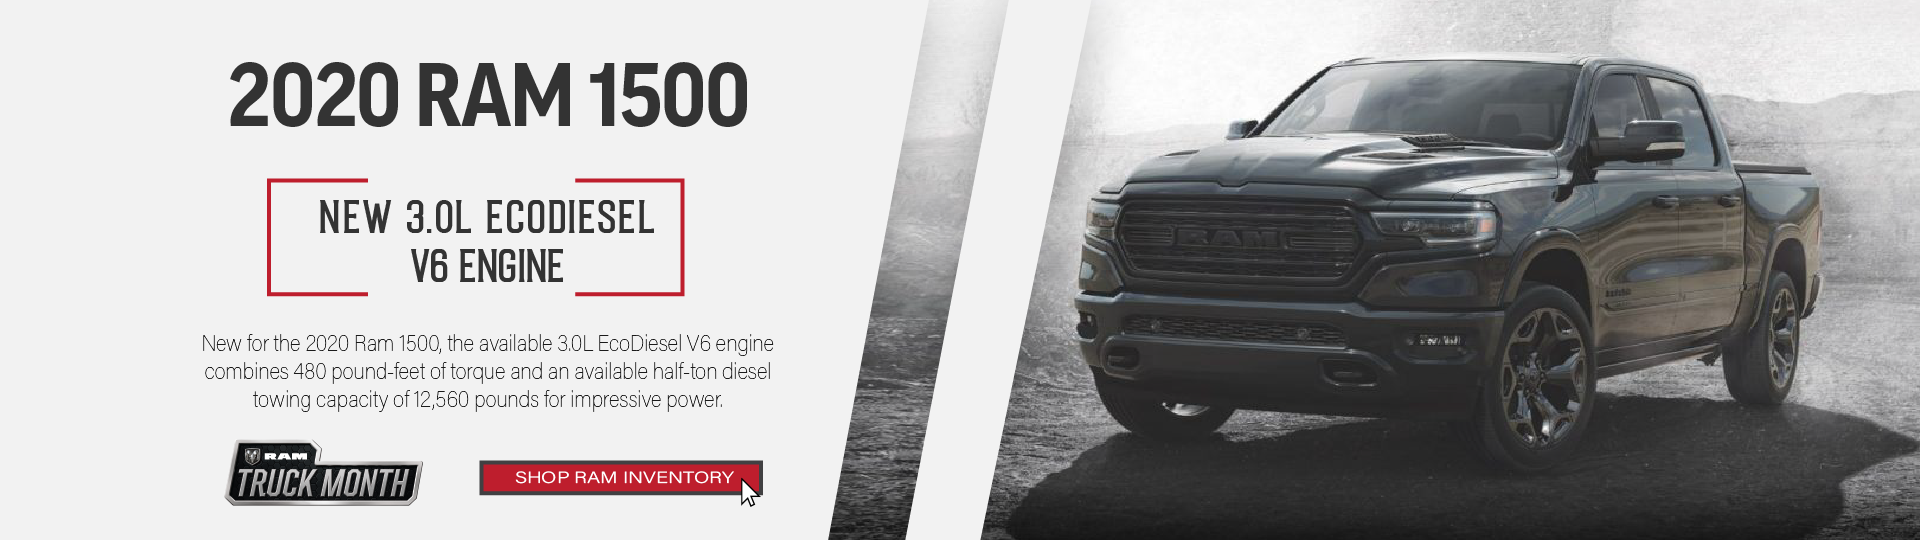 Black 2020 RAM 1500 truck ad